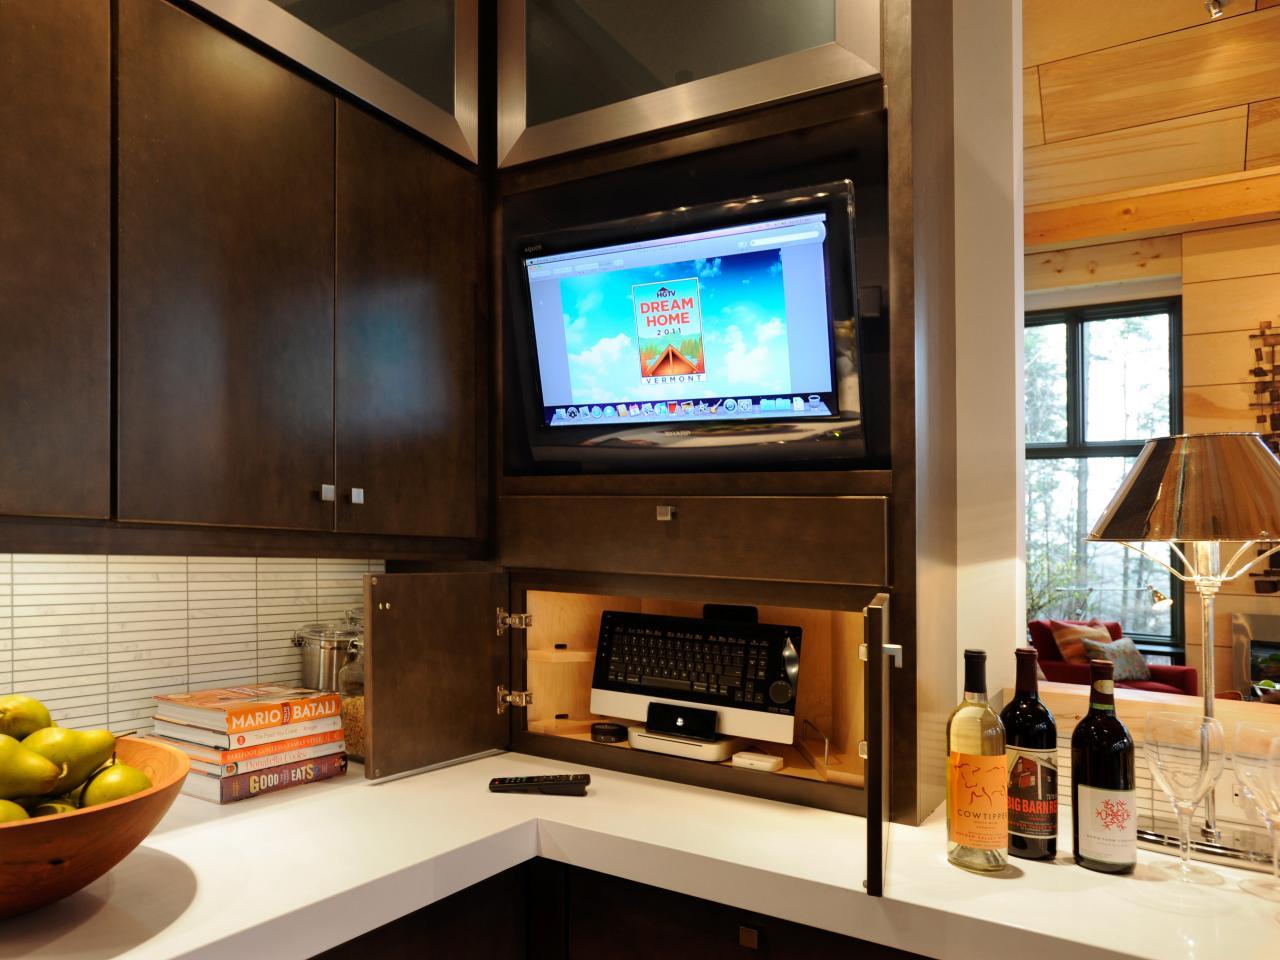 Встраиваемый телевизор на кухне